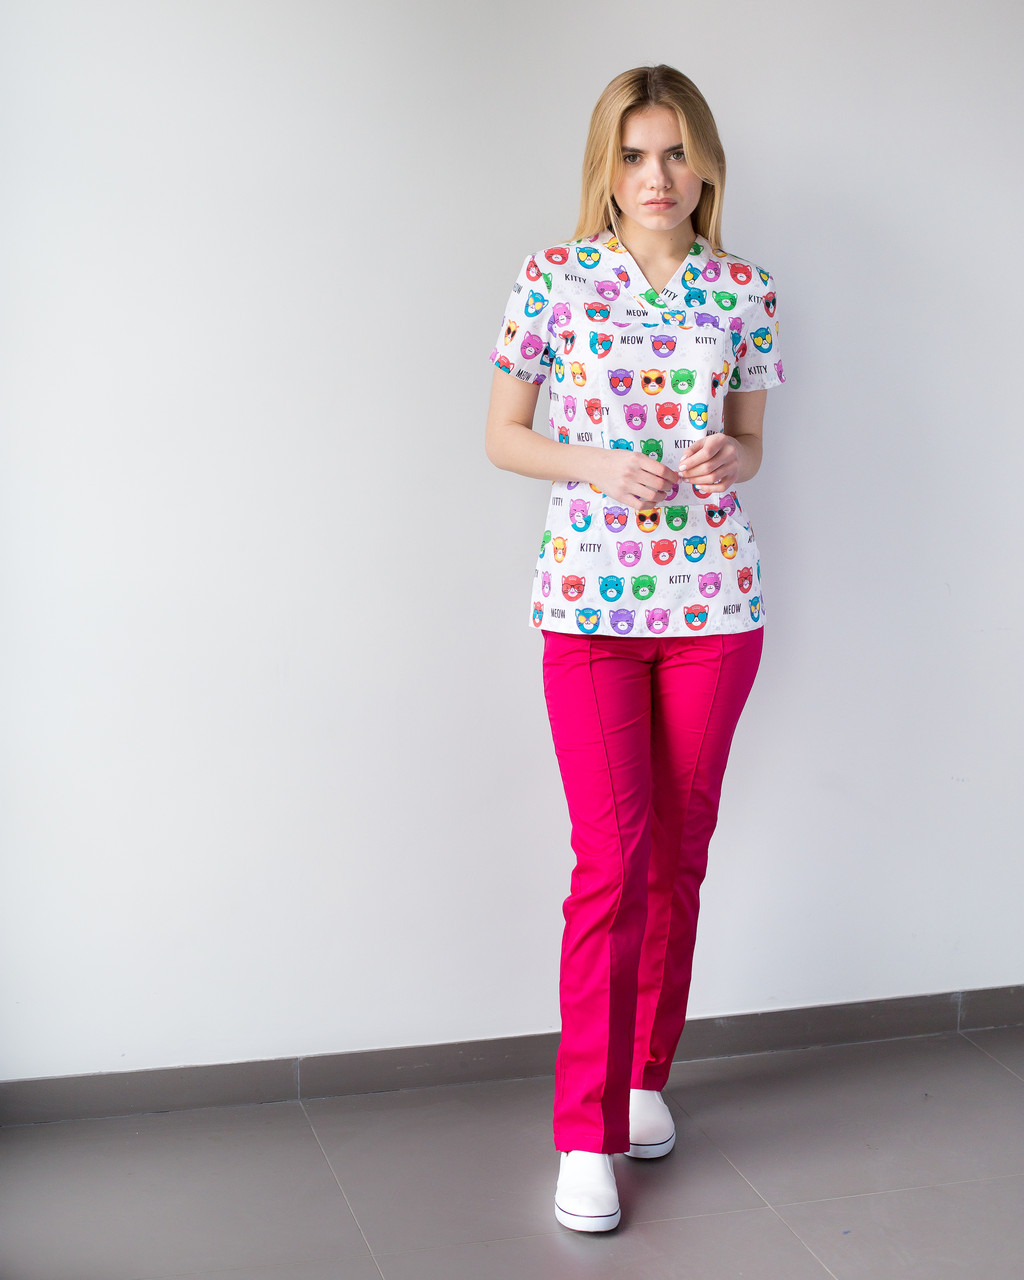 Медицинский женский костюм Топаз принт  Cats colored